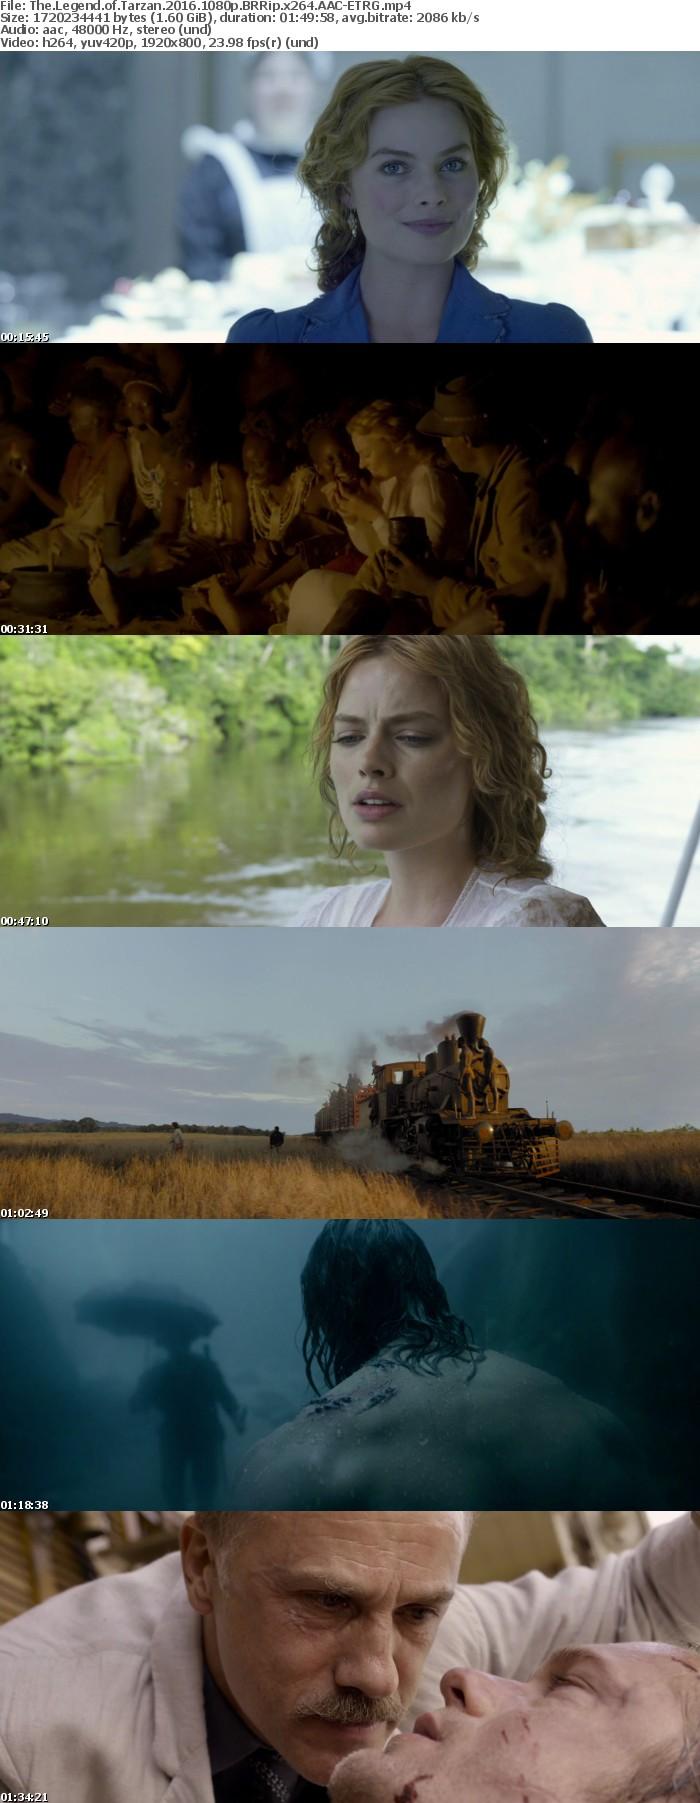 The Legend of Tarzan 2016 1080p BRRip x264 AAC ETRG